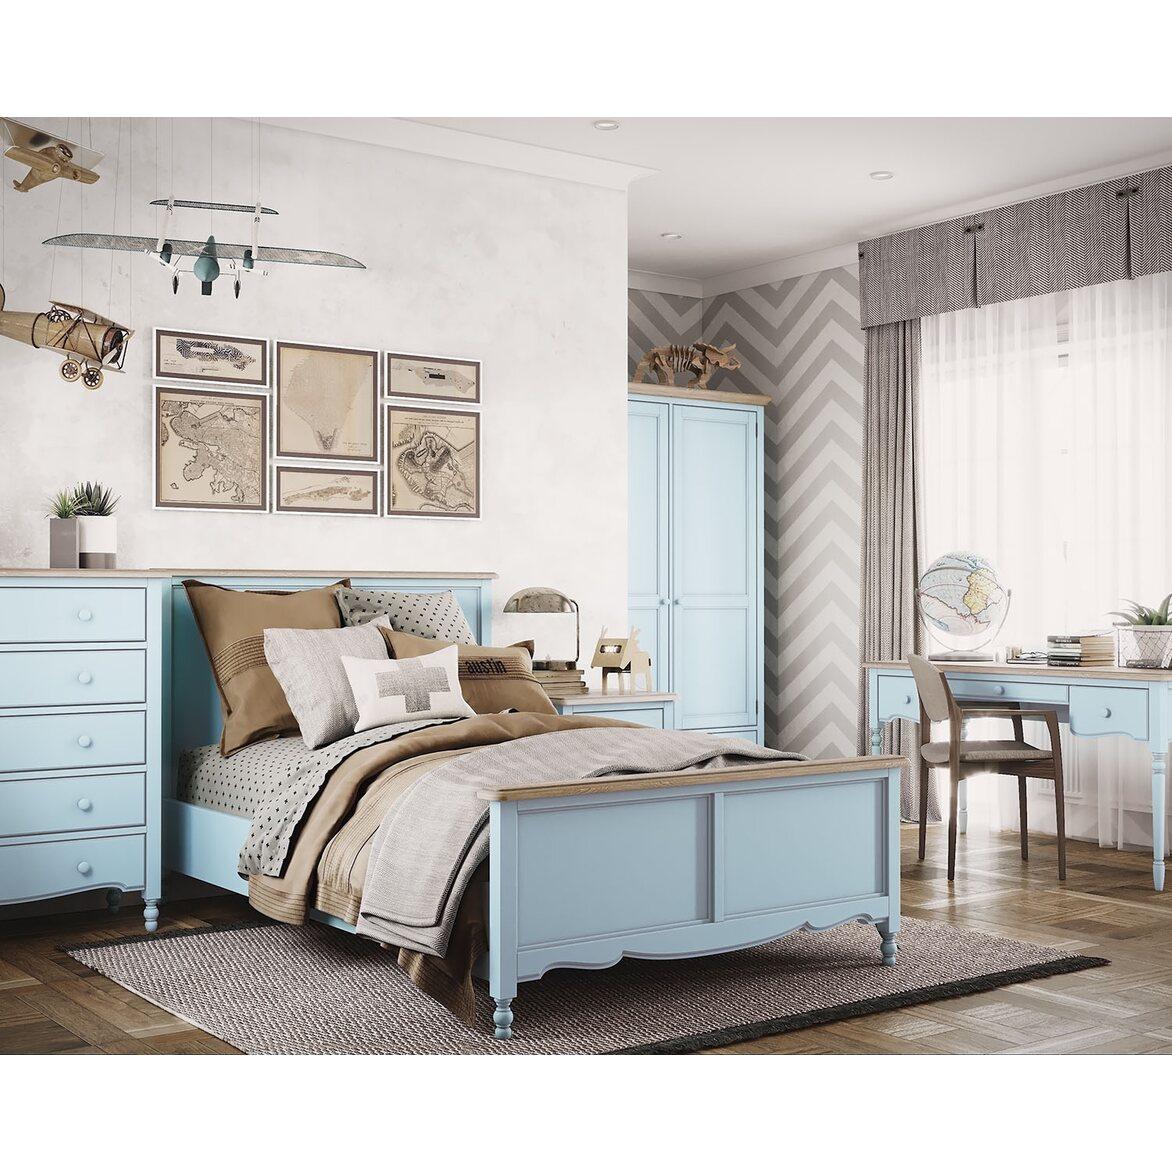 Шкаф двухстворчатый Leblanc, голубой 3 | Платяные шкафы Kingsby